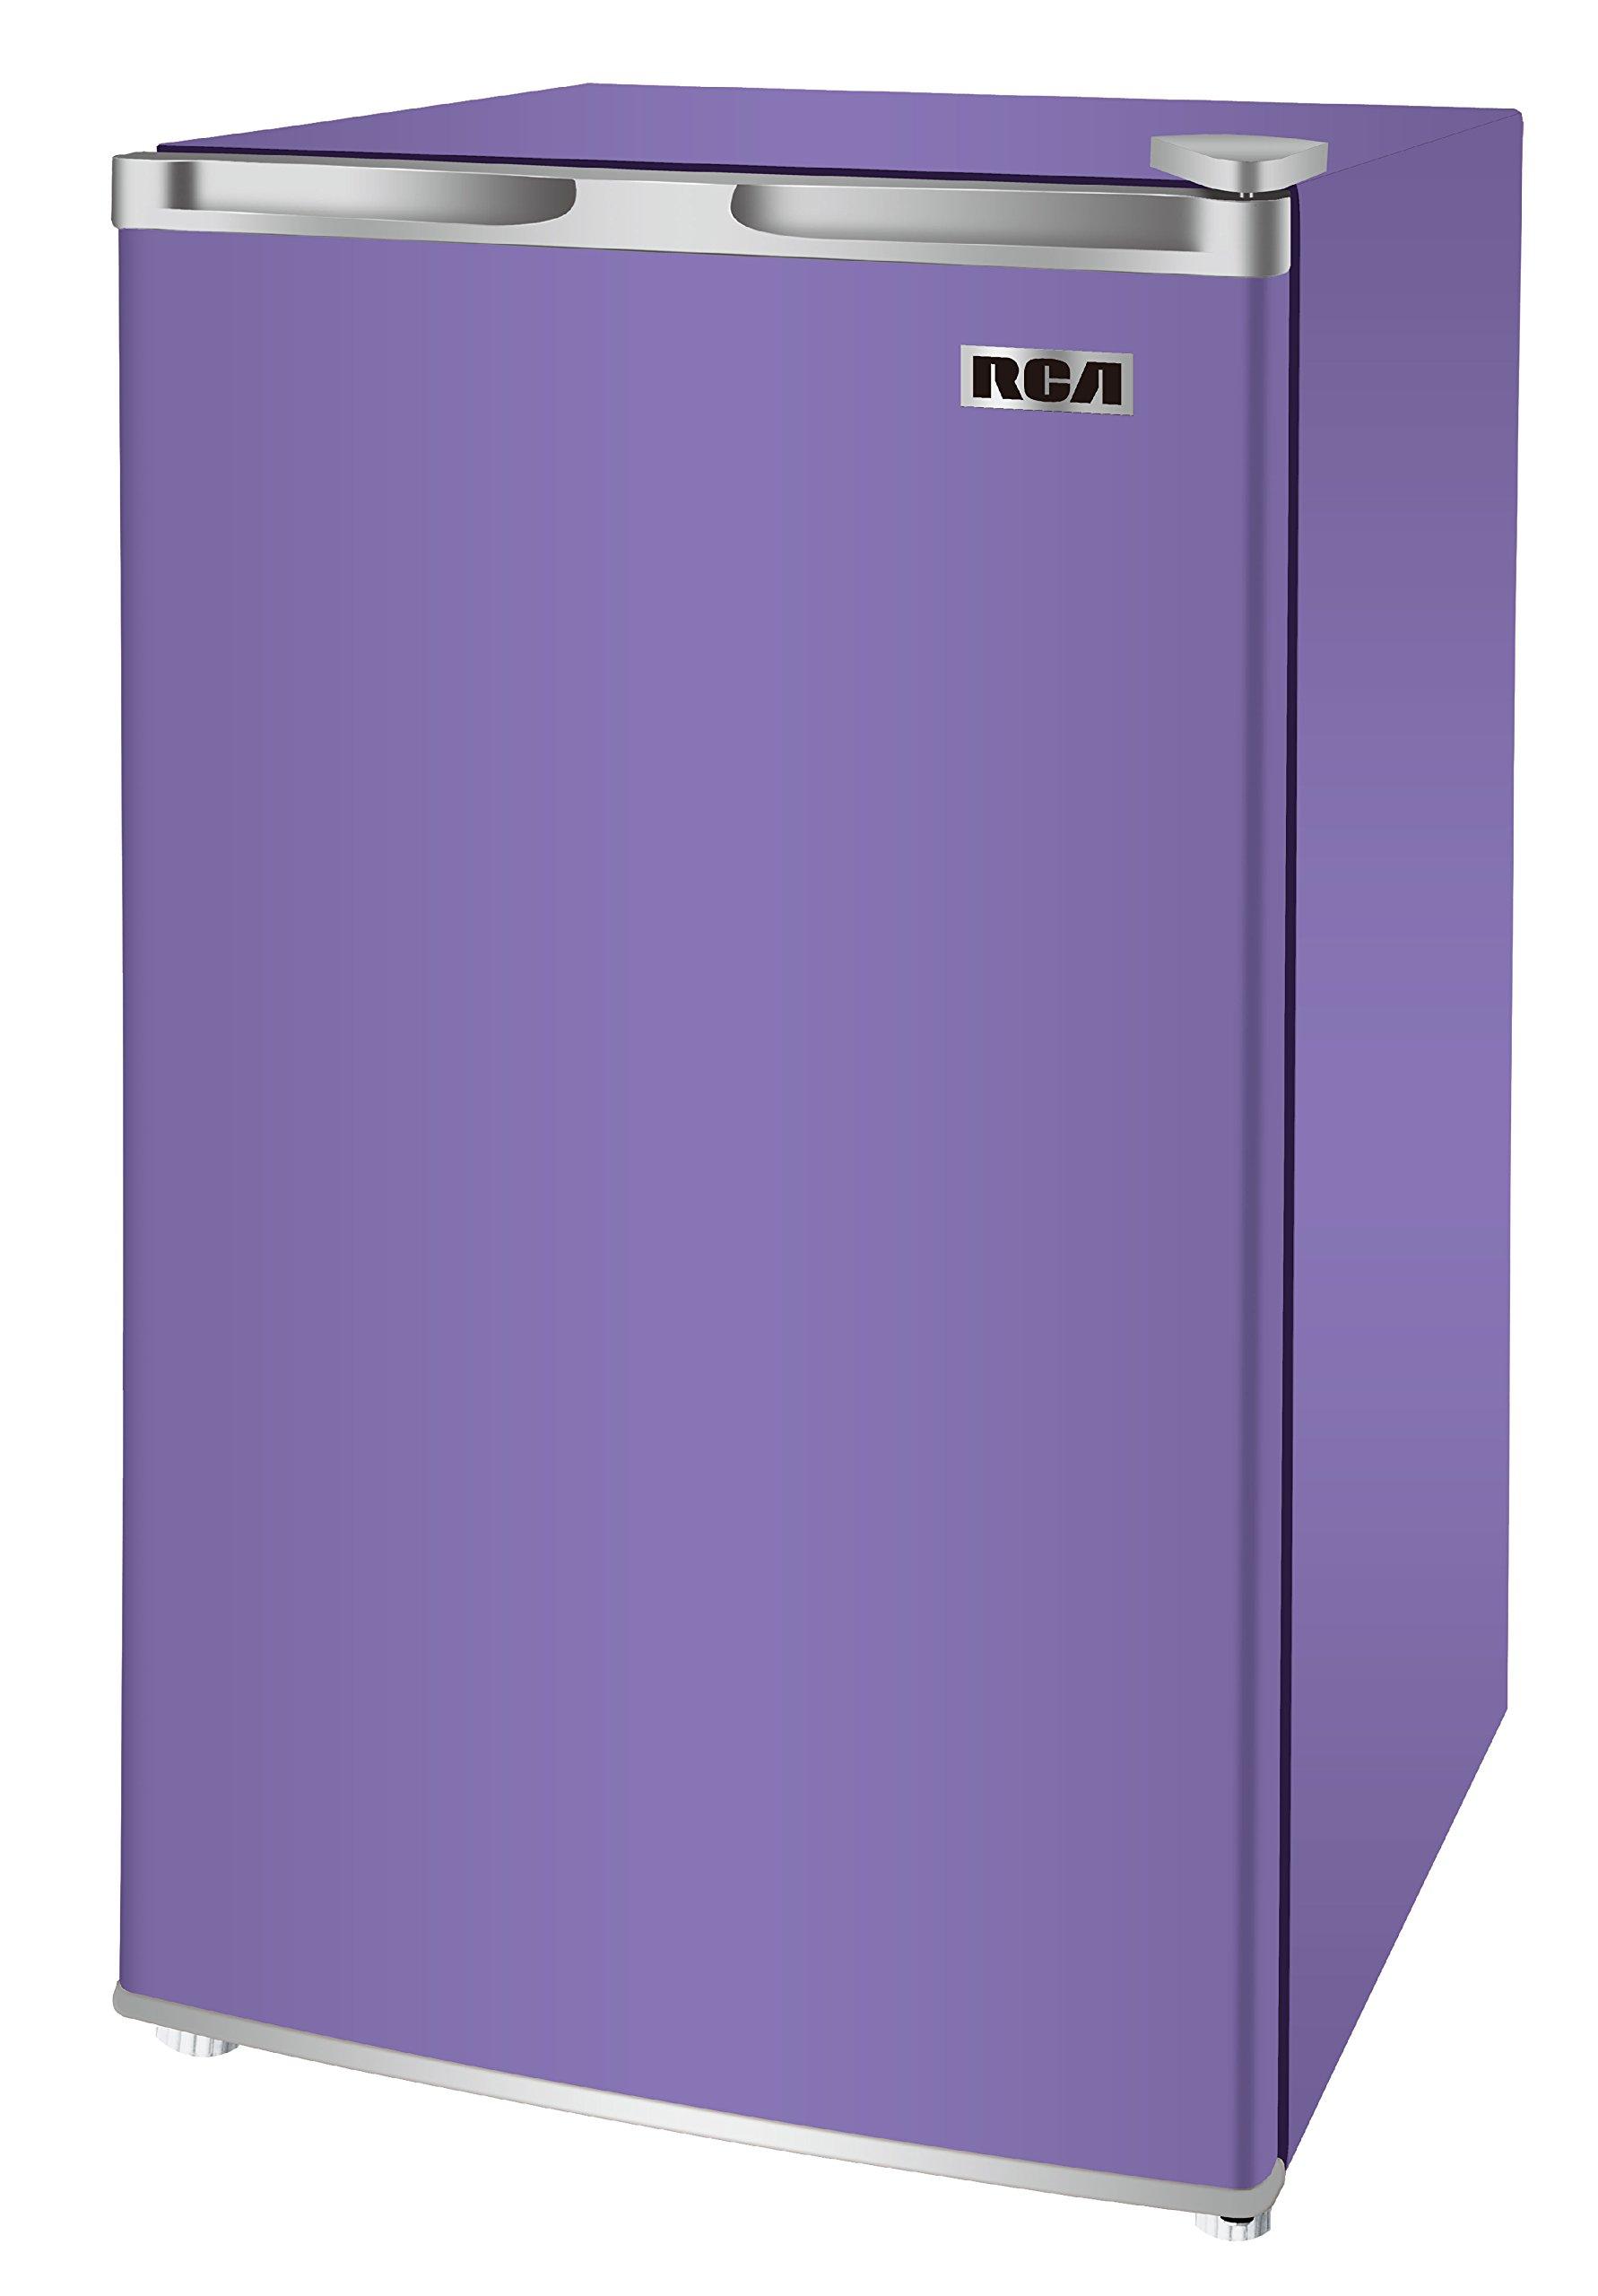 RCA RFR321-FR320/8 IGLOO Mini Refrigerator, 3.2 Cu Ft Fridge, Purple